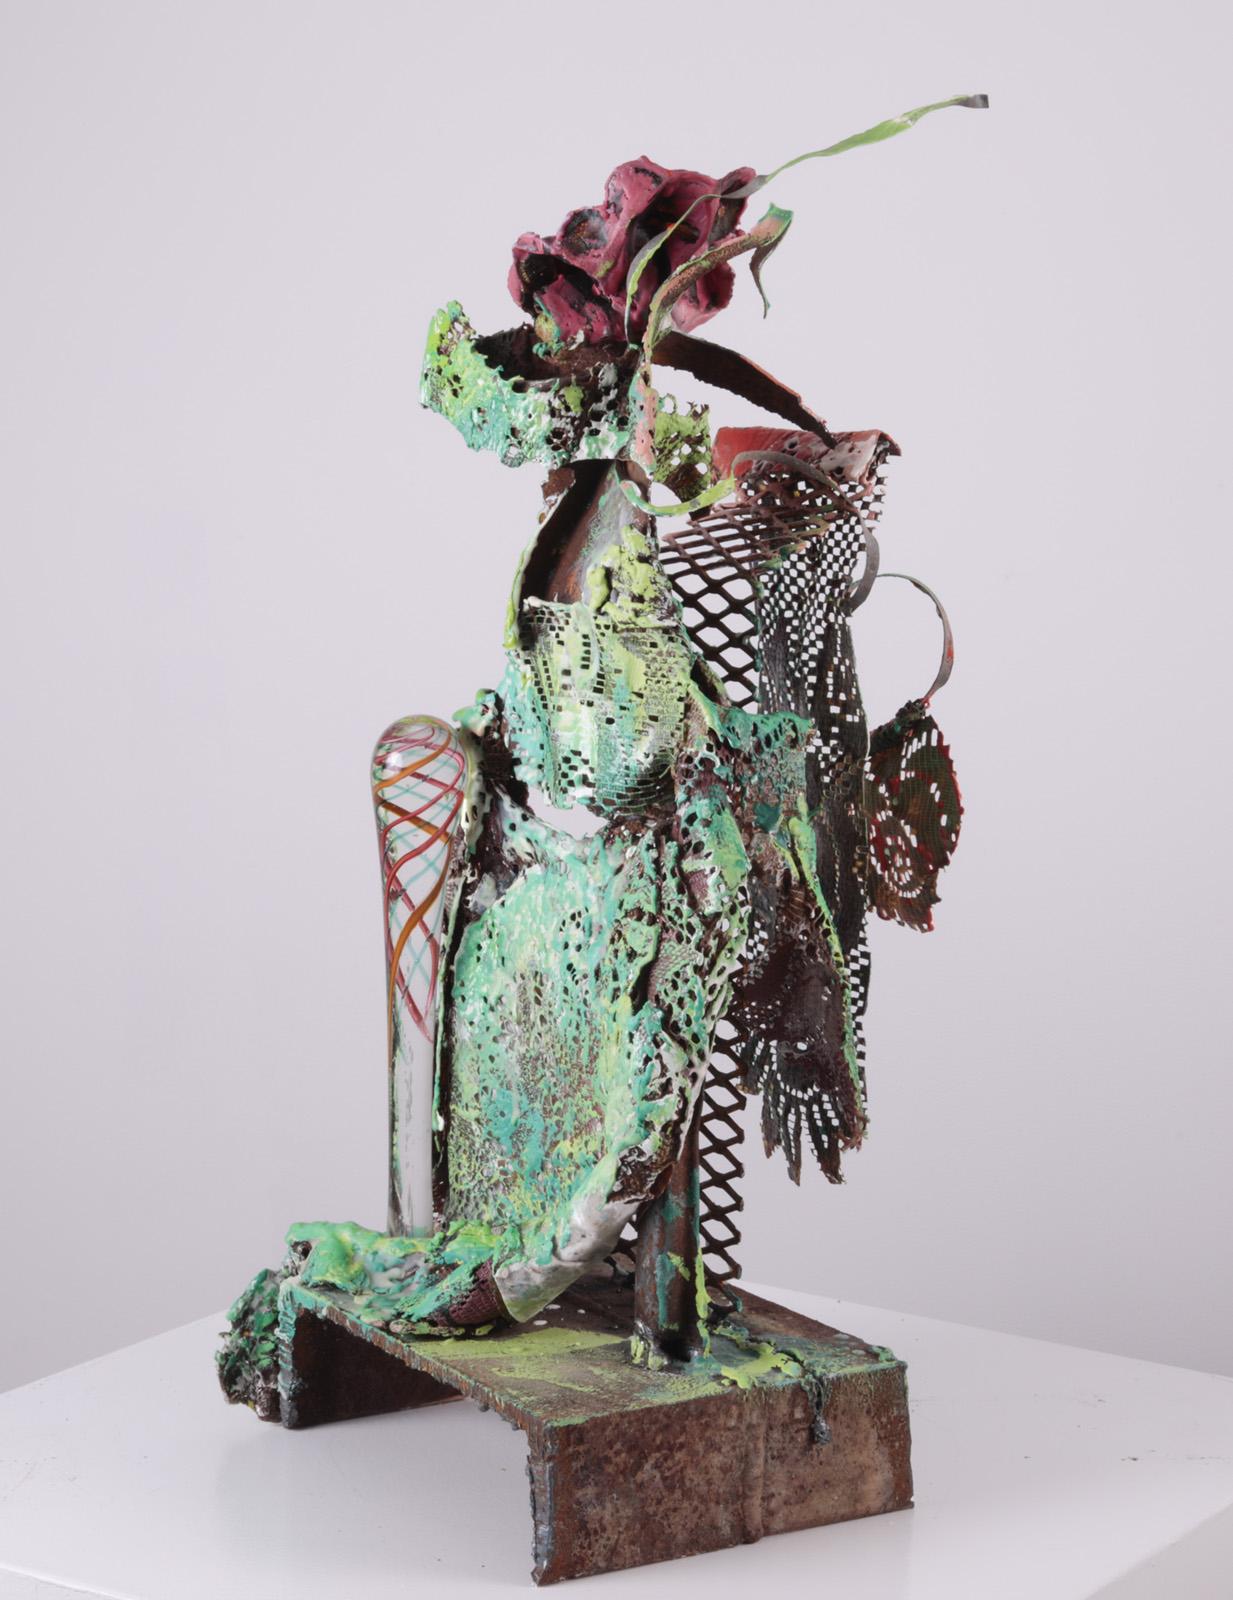 Darlington_LikeFlower_Sculpture1.jpeg